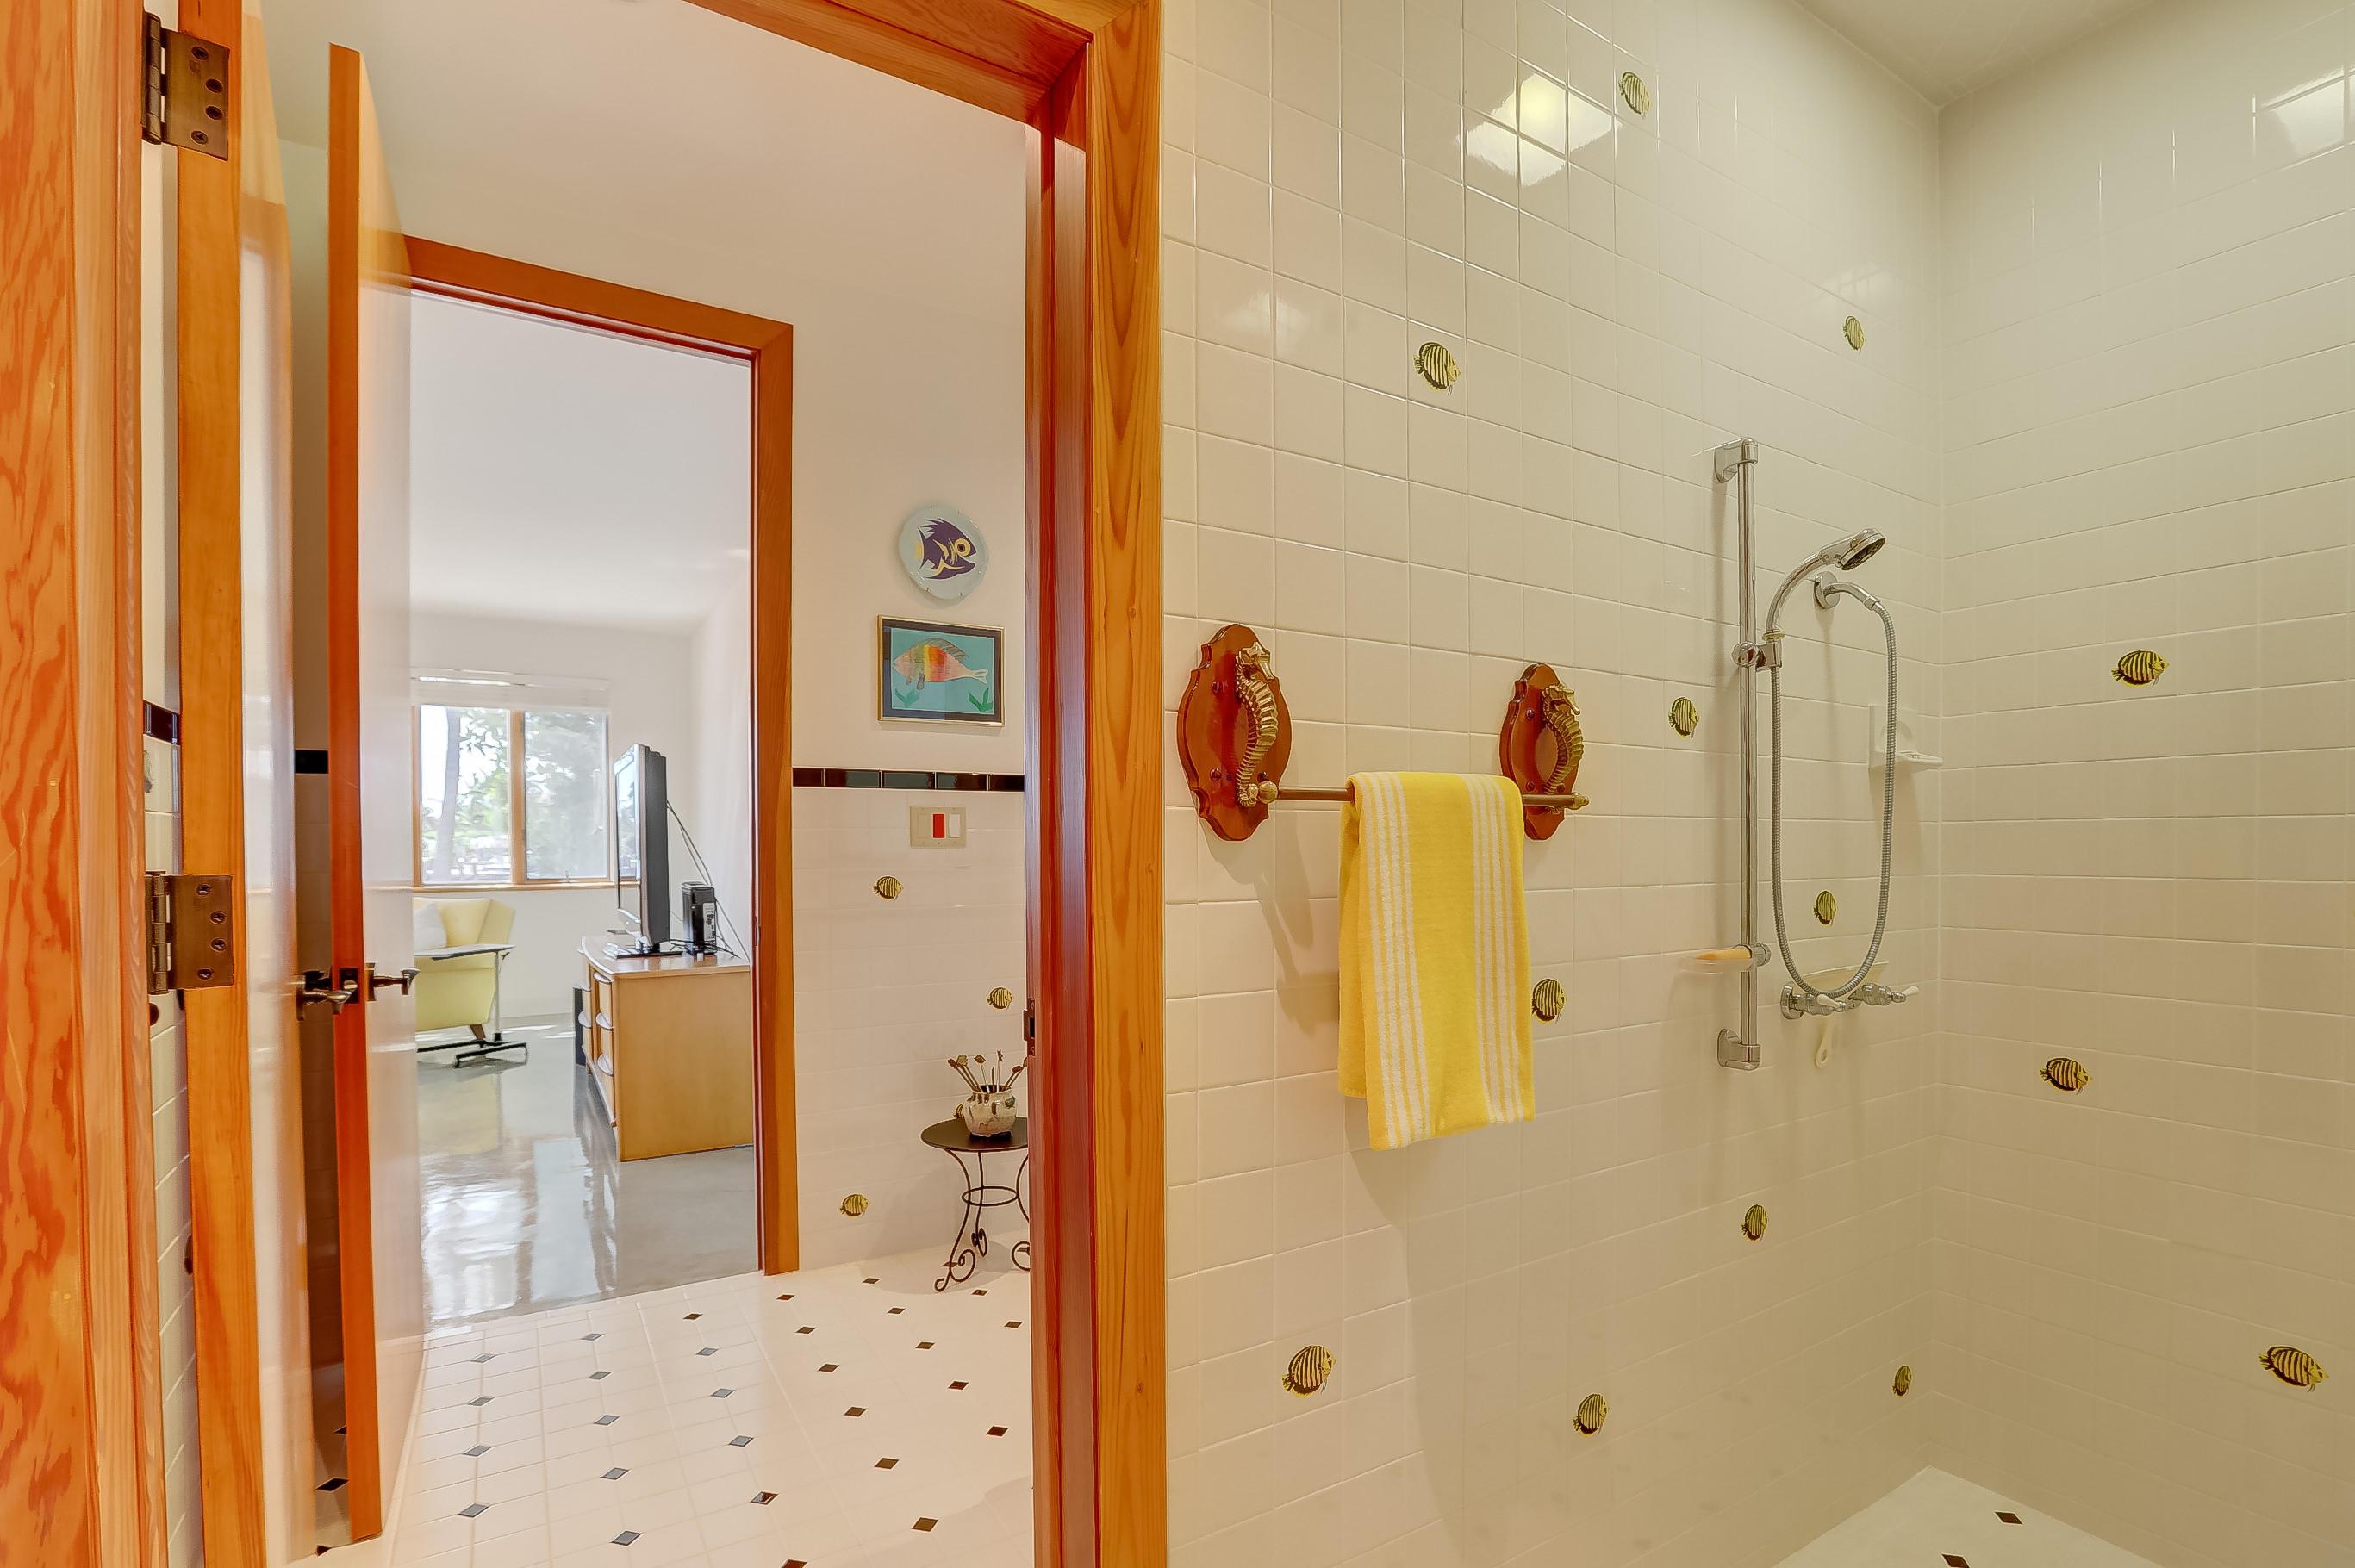 Cabana Bath Separate Shower